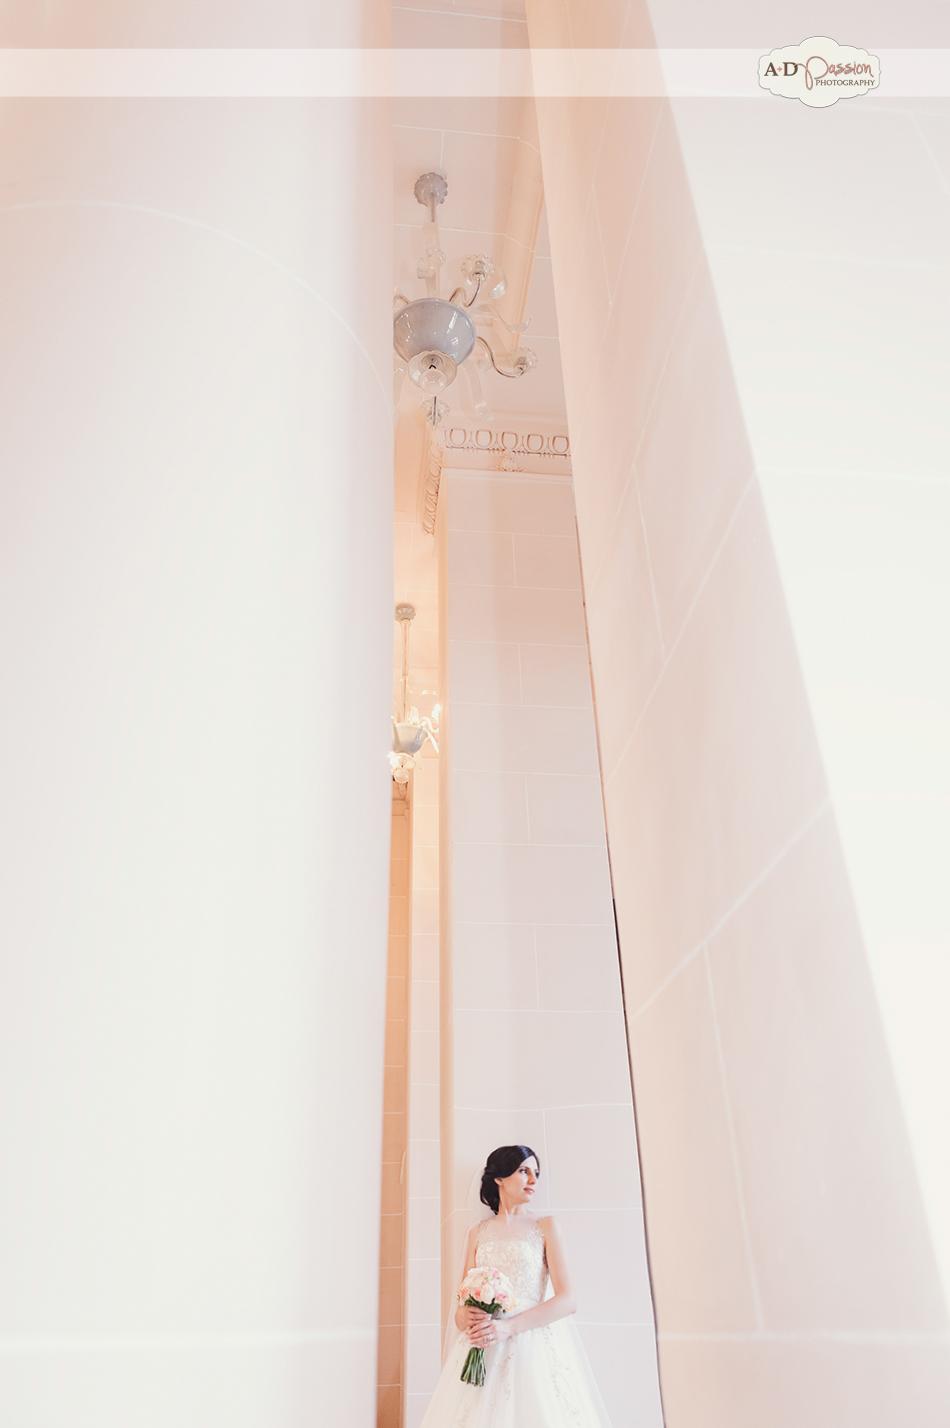 AD Passion Photography | 20130818_fotograf-nunta-vintage_fotograf-profesionist_nunta-ploiesti_razvan-si-elisa_0090 | Adelin, Dida, fotograf profesionist, fotograf de nunta, fotografie de nunta, fotograf Timisoara, fotograf Craiova, fotograf Bucuresti, fotograf Arad, nunta Timisoara, nunta Arad, nunta Bucuresti, nunta Craiova